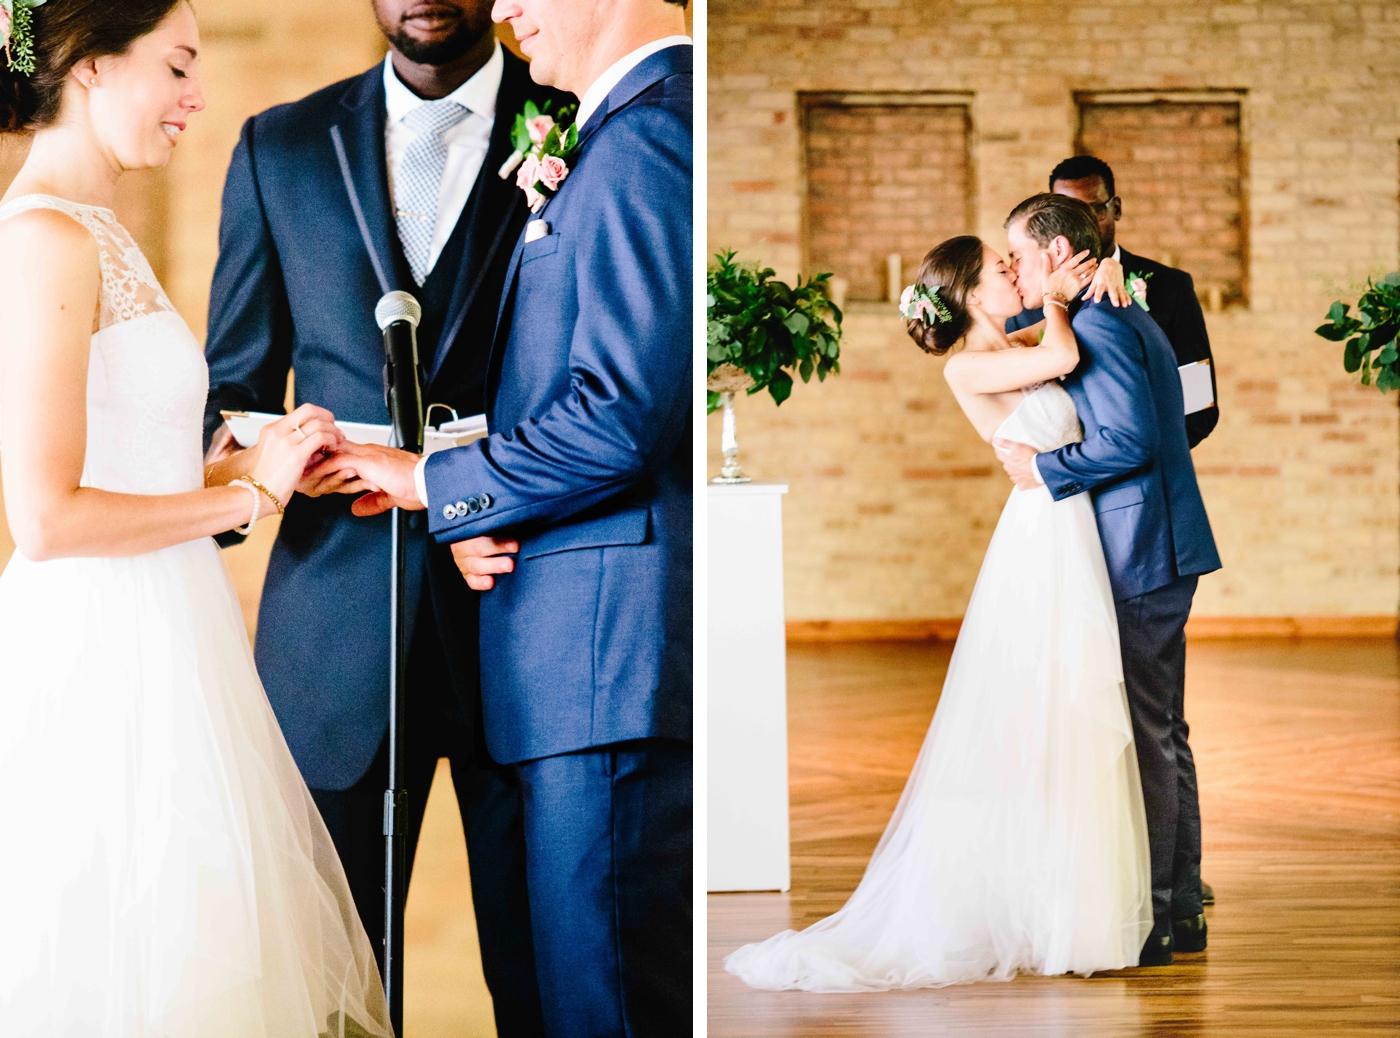 chicago-fine-art-wedding-photography-tyma29